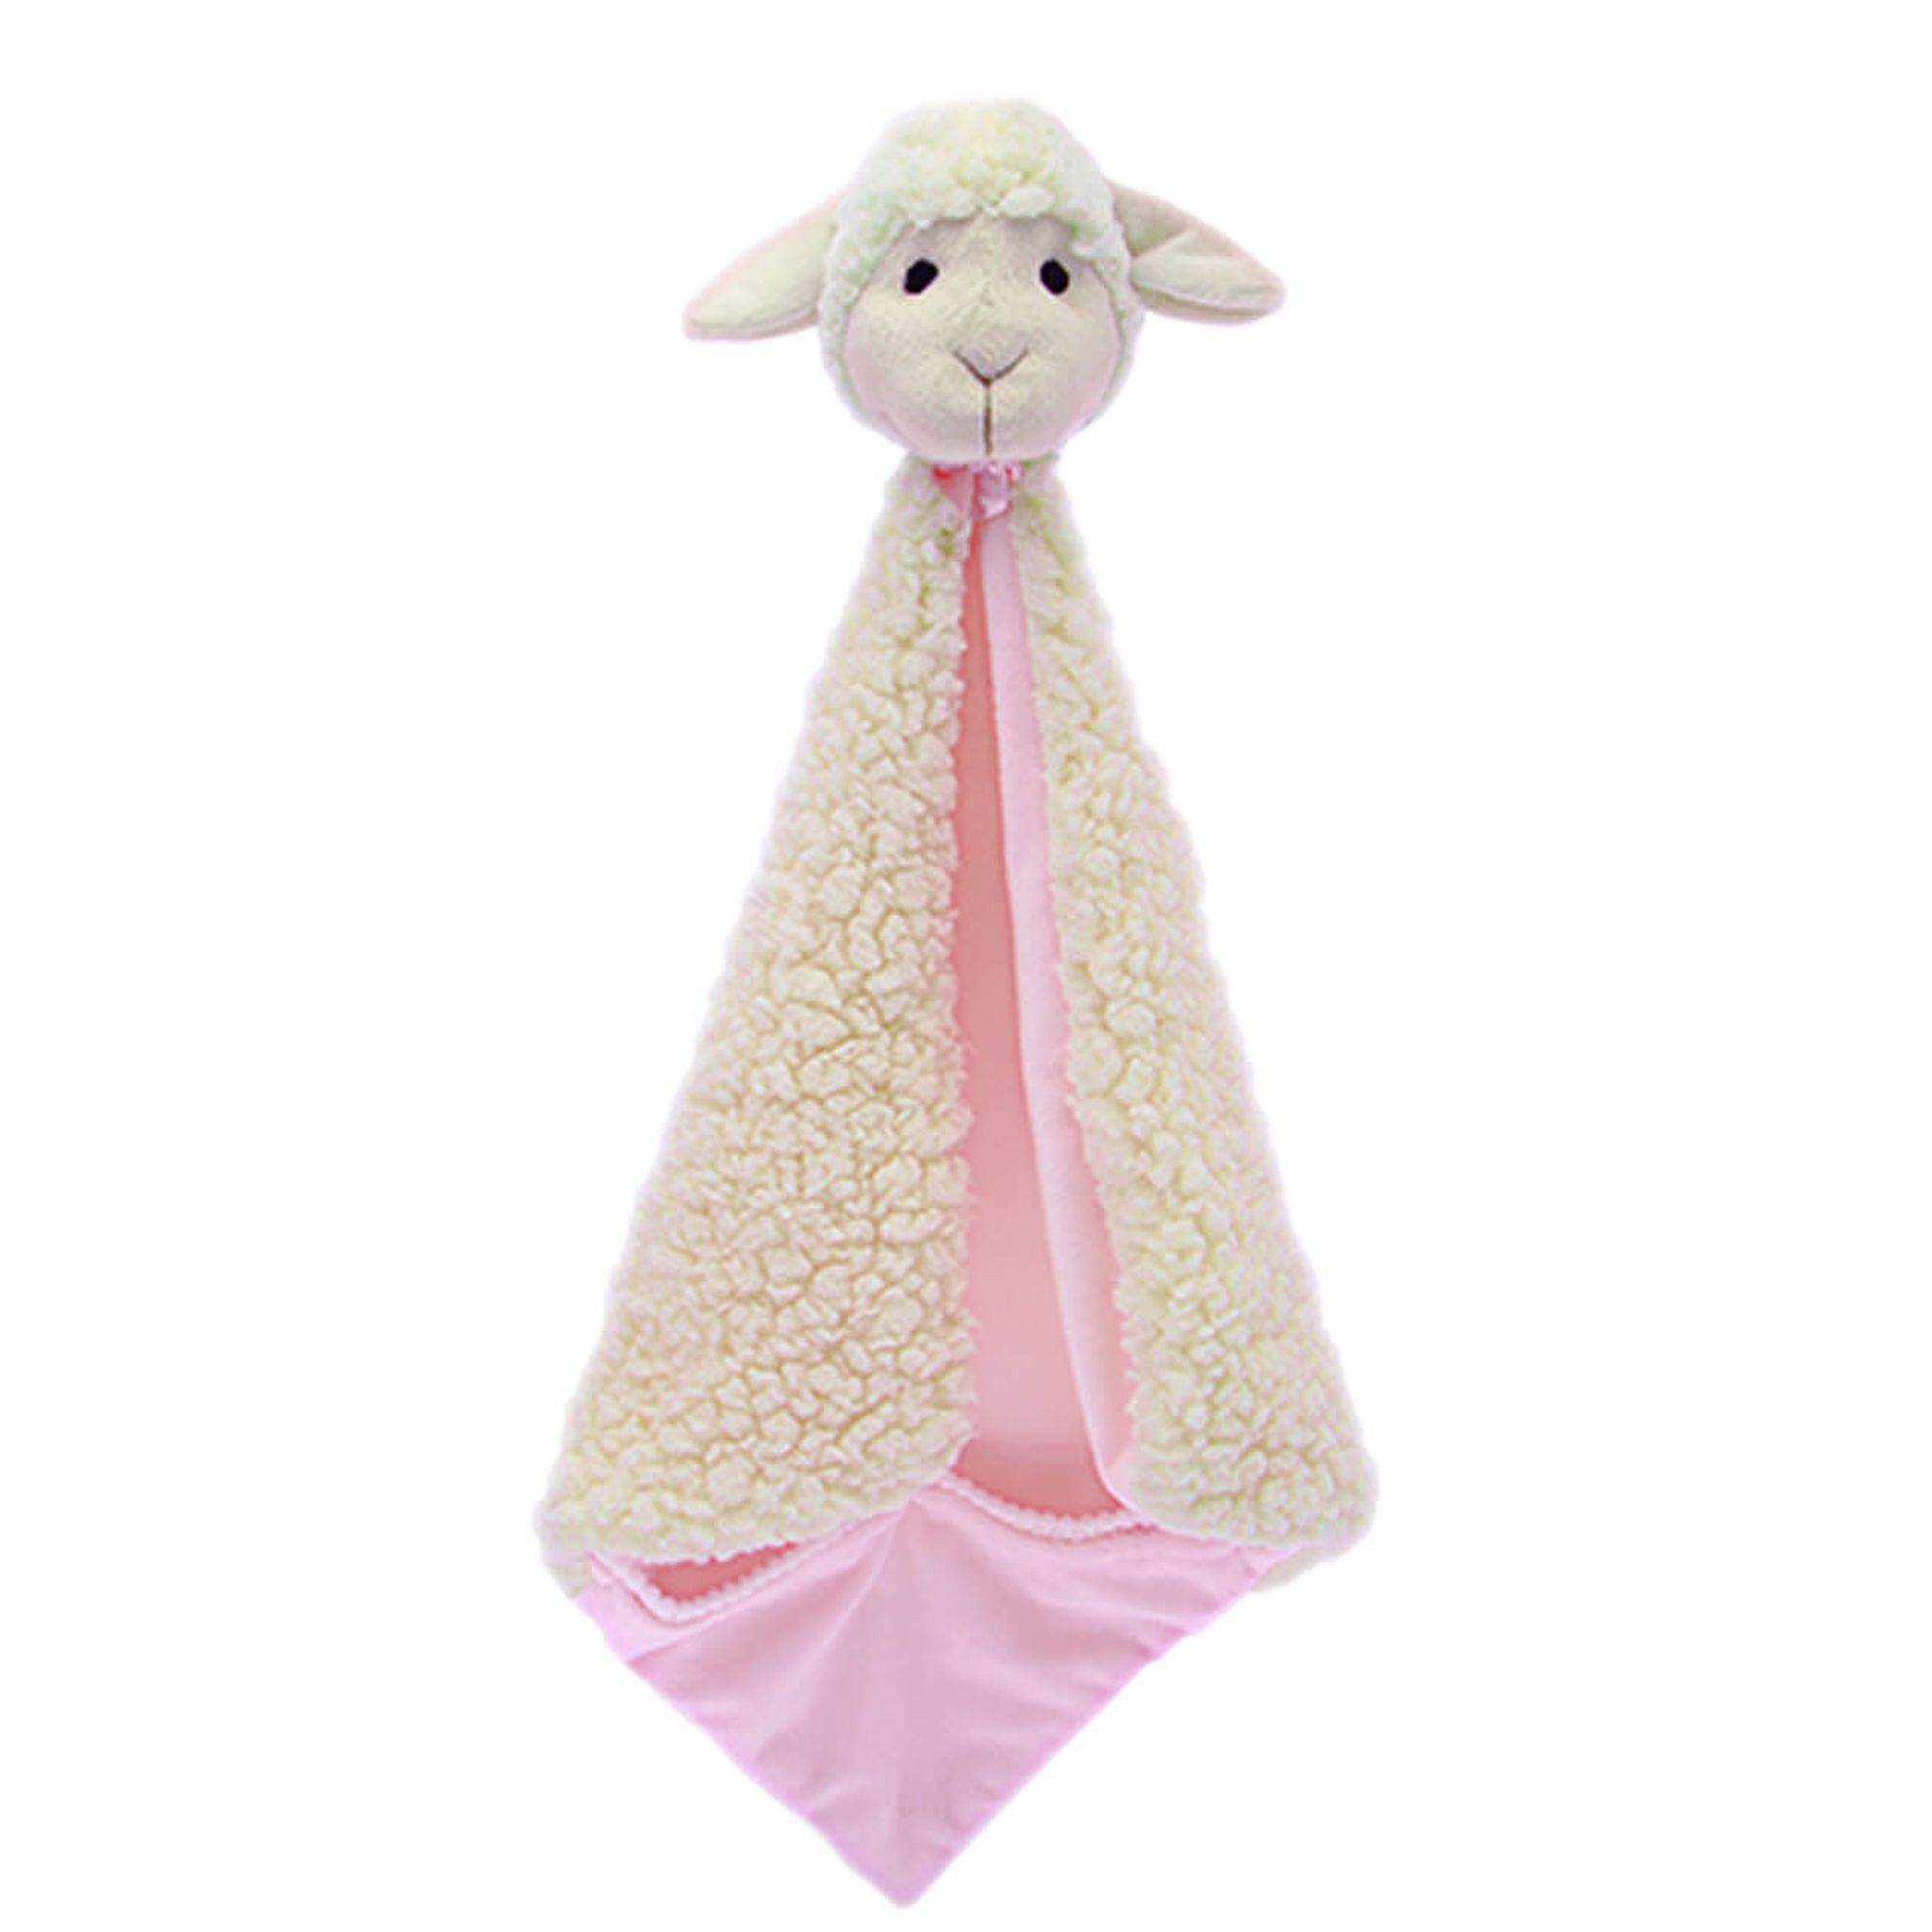 naninha-pelucia-ovelha-rosa-silvia-polito